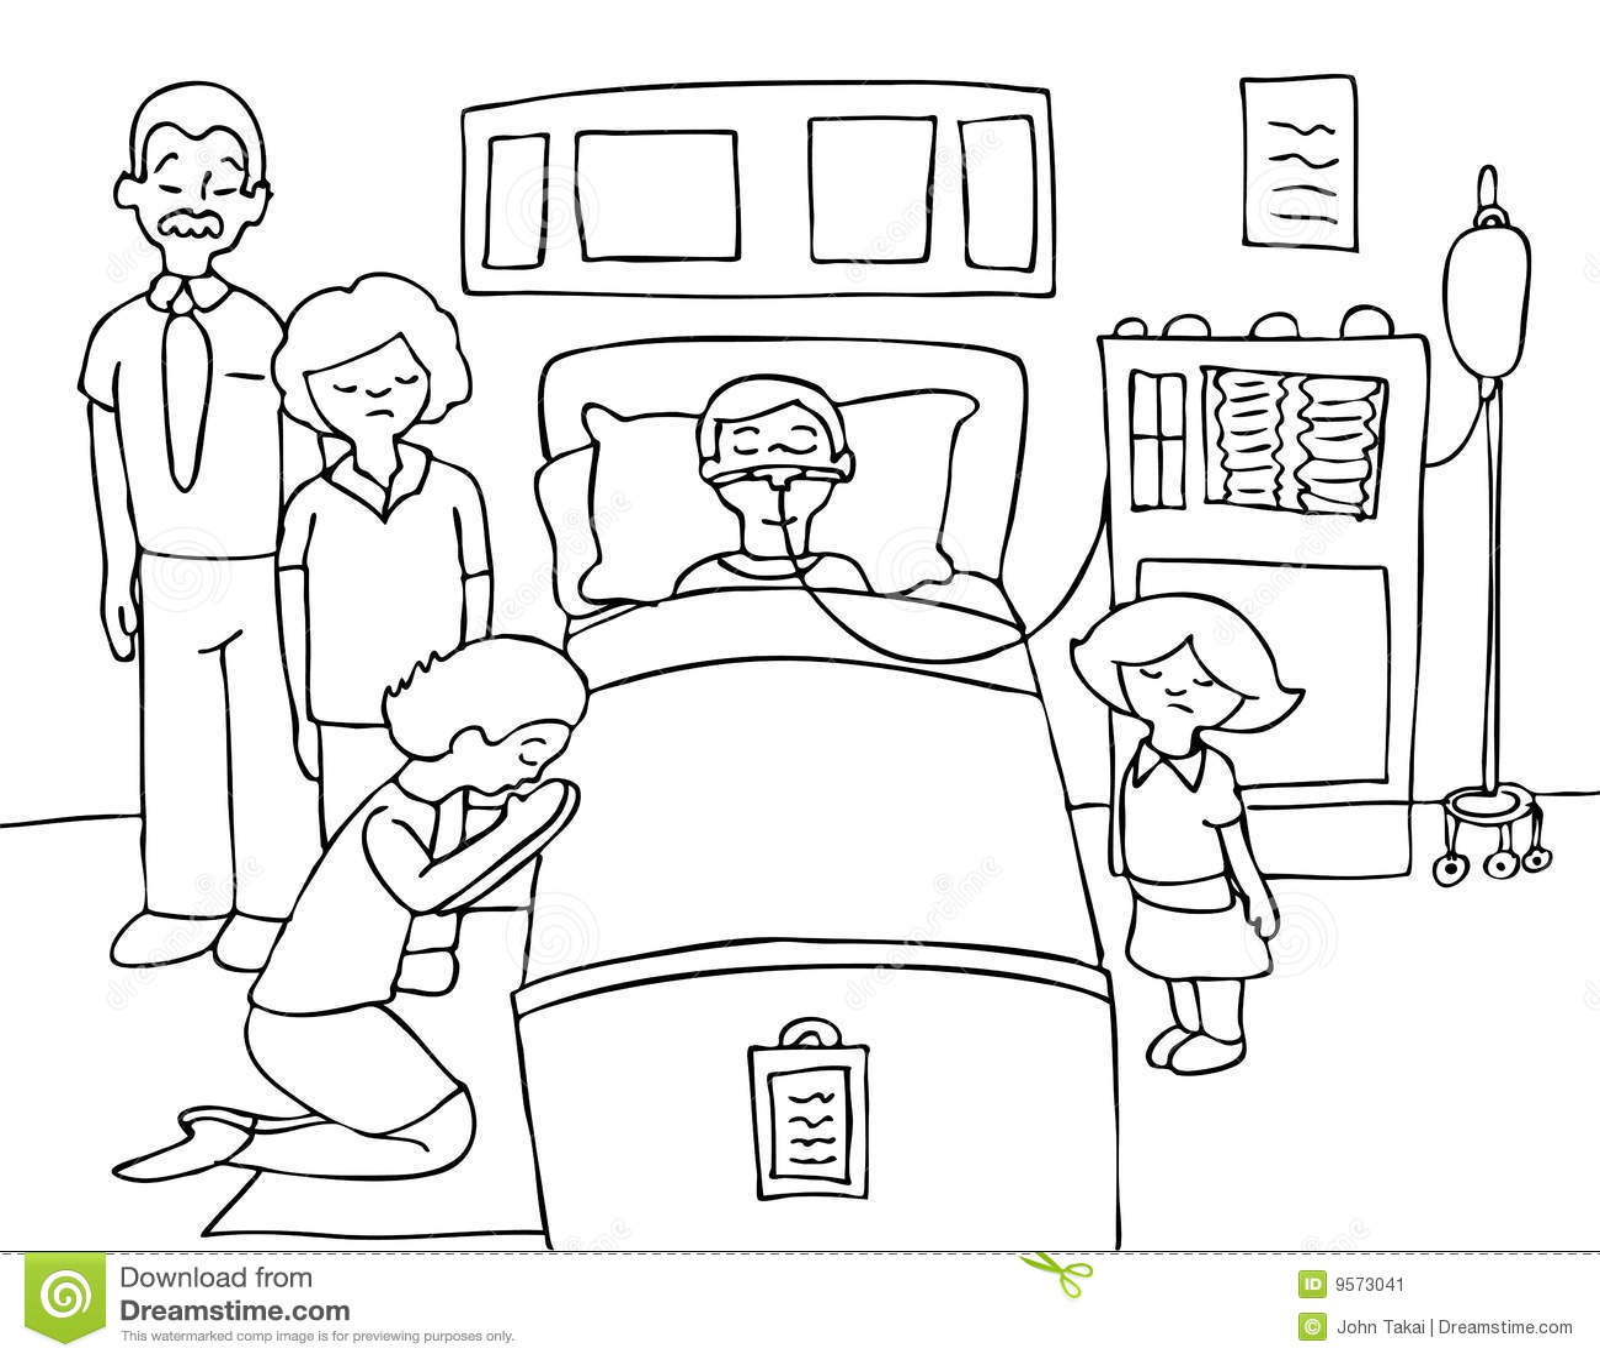 Crying Baby Hospital